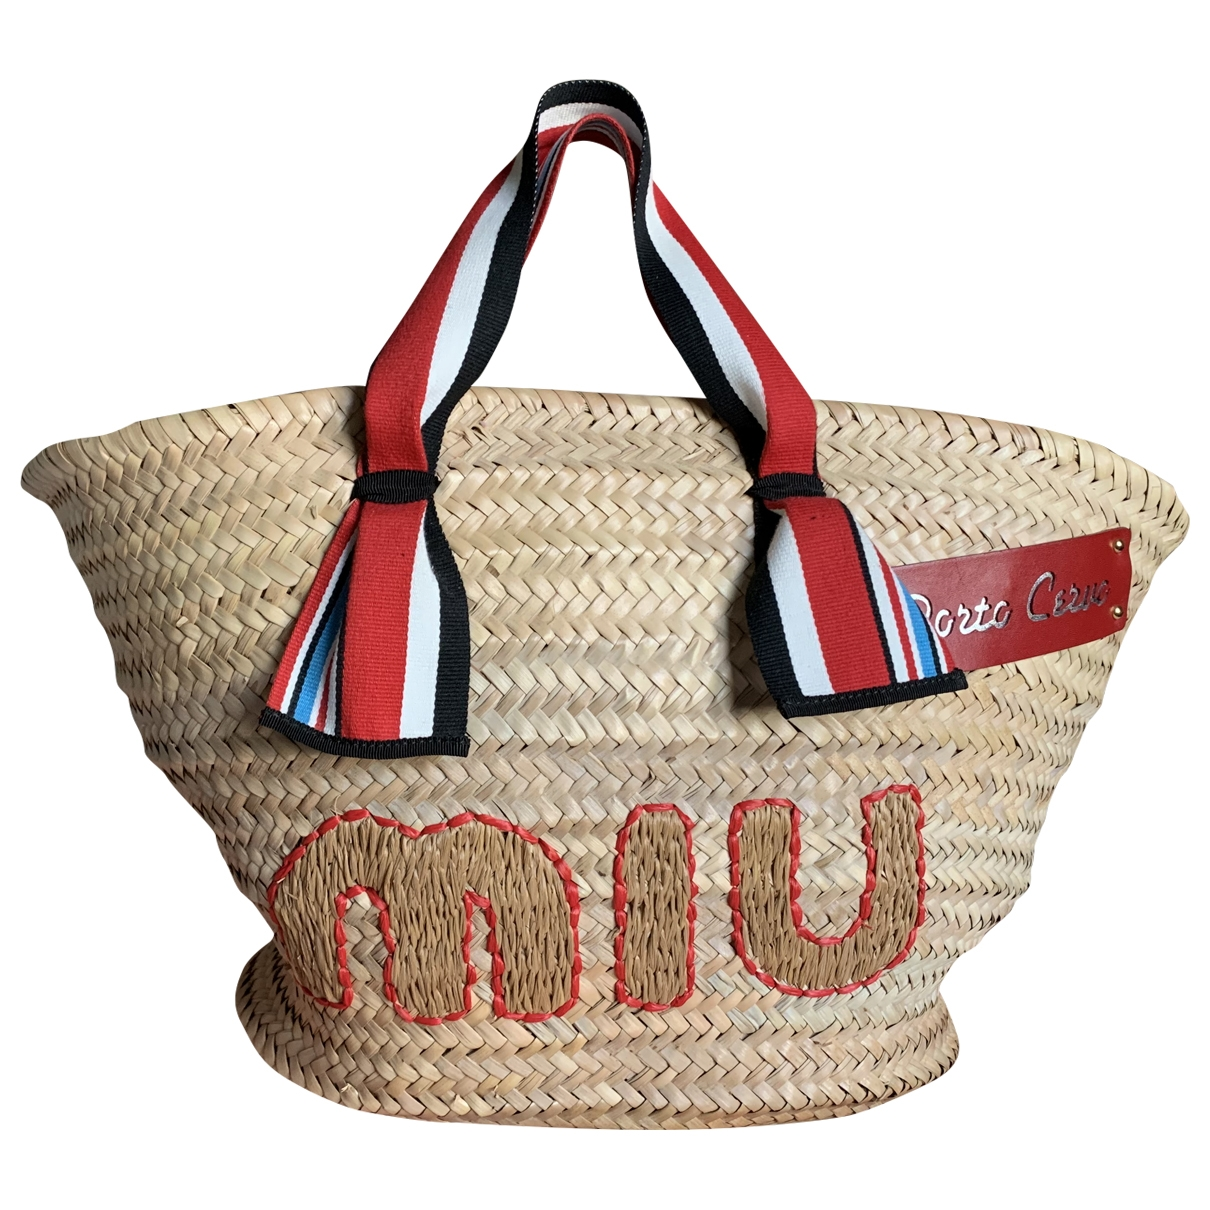 Miu Miu \N Beige Cotton handbag for Women \N